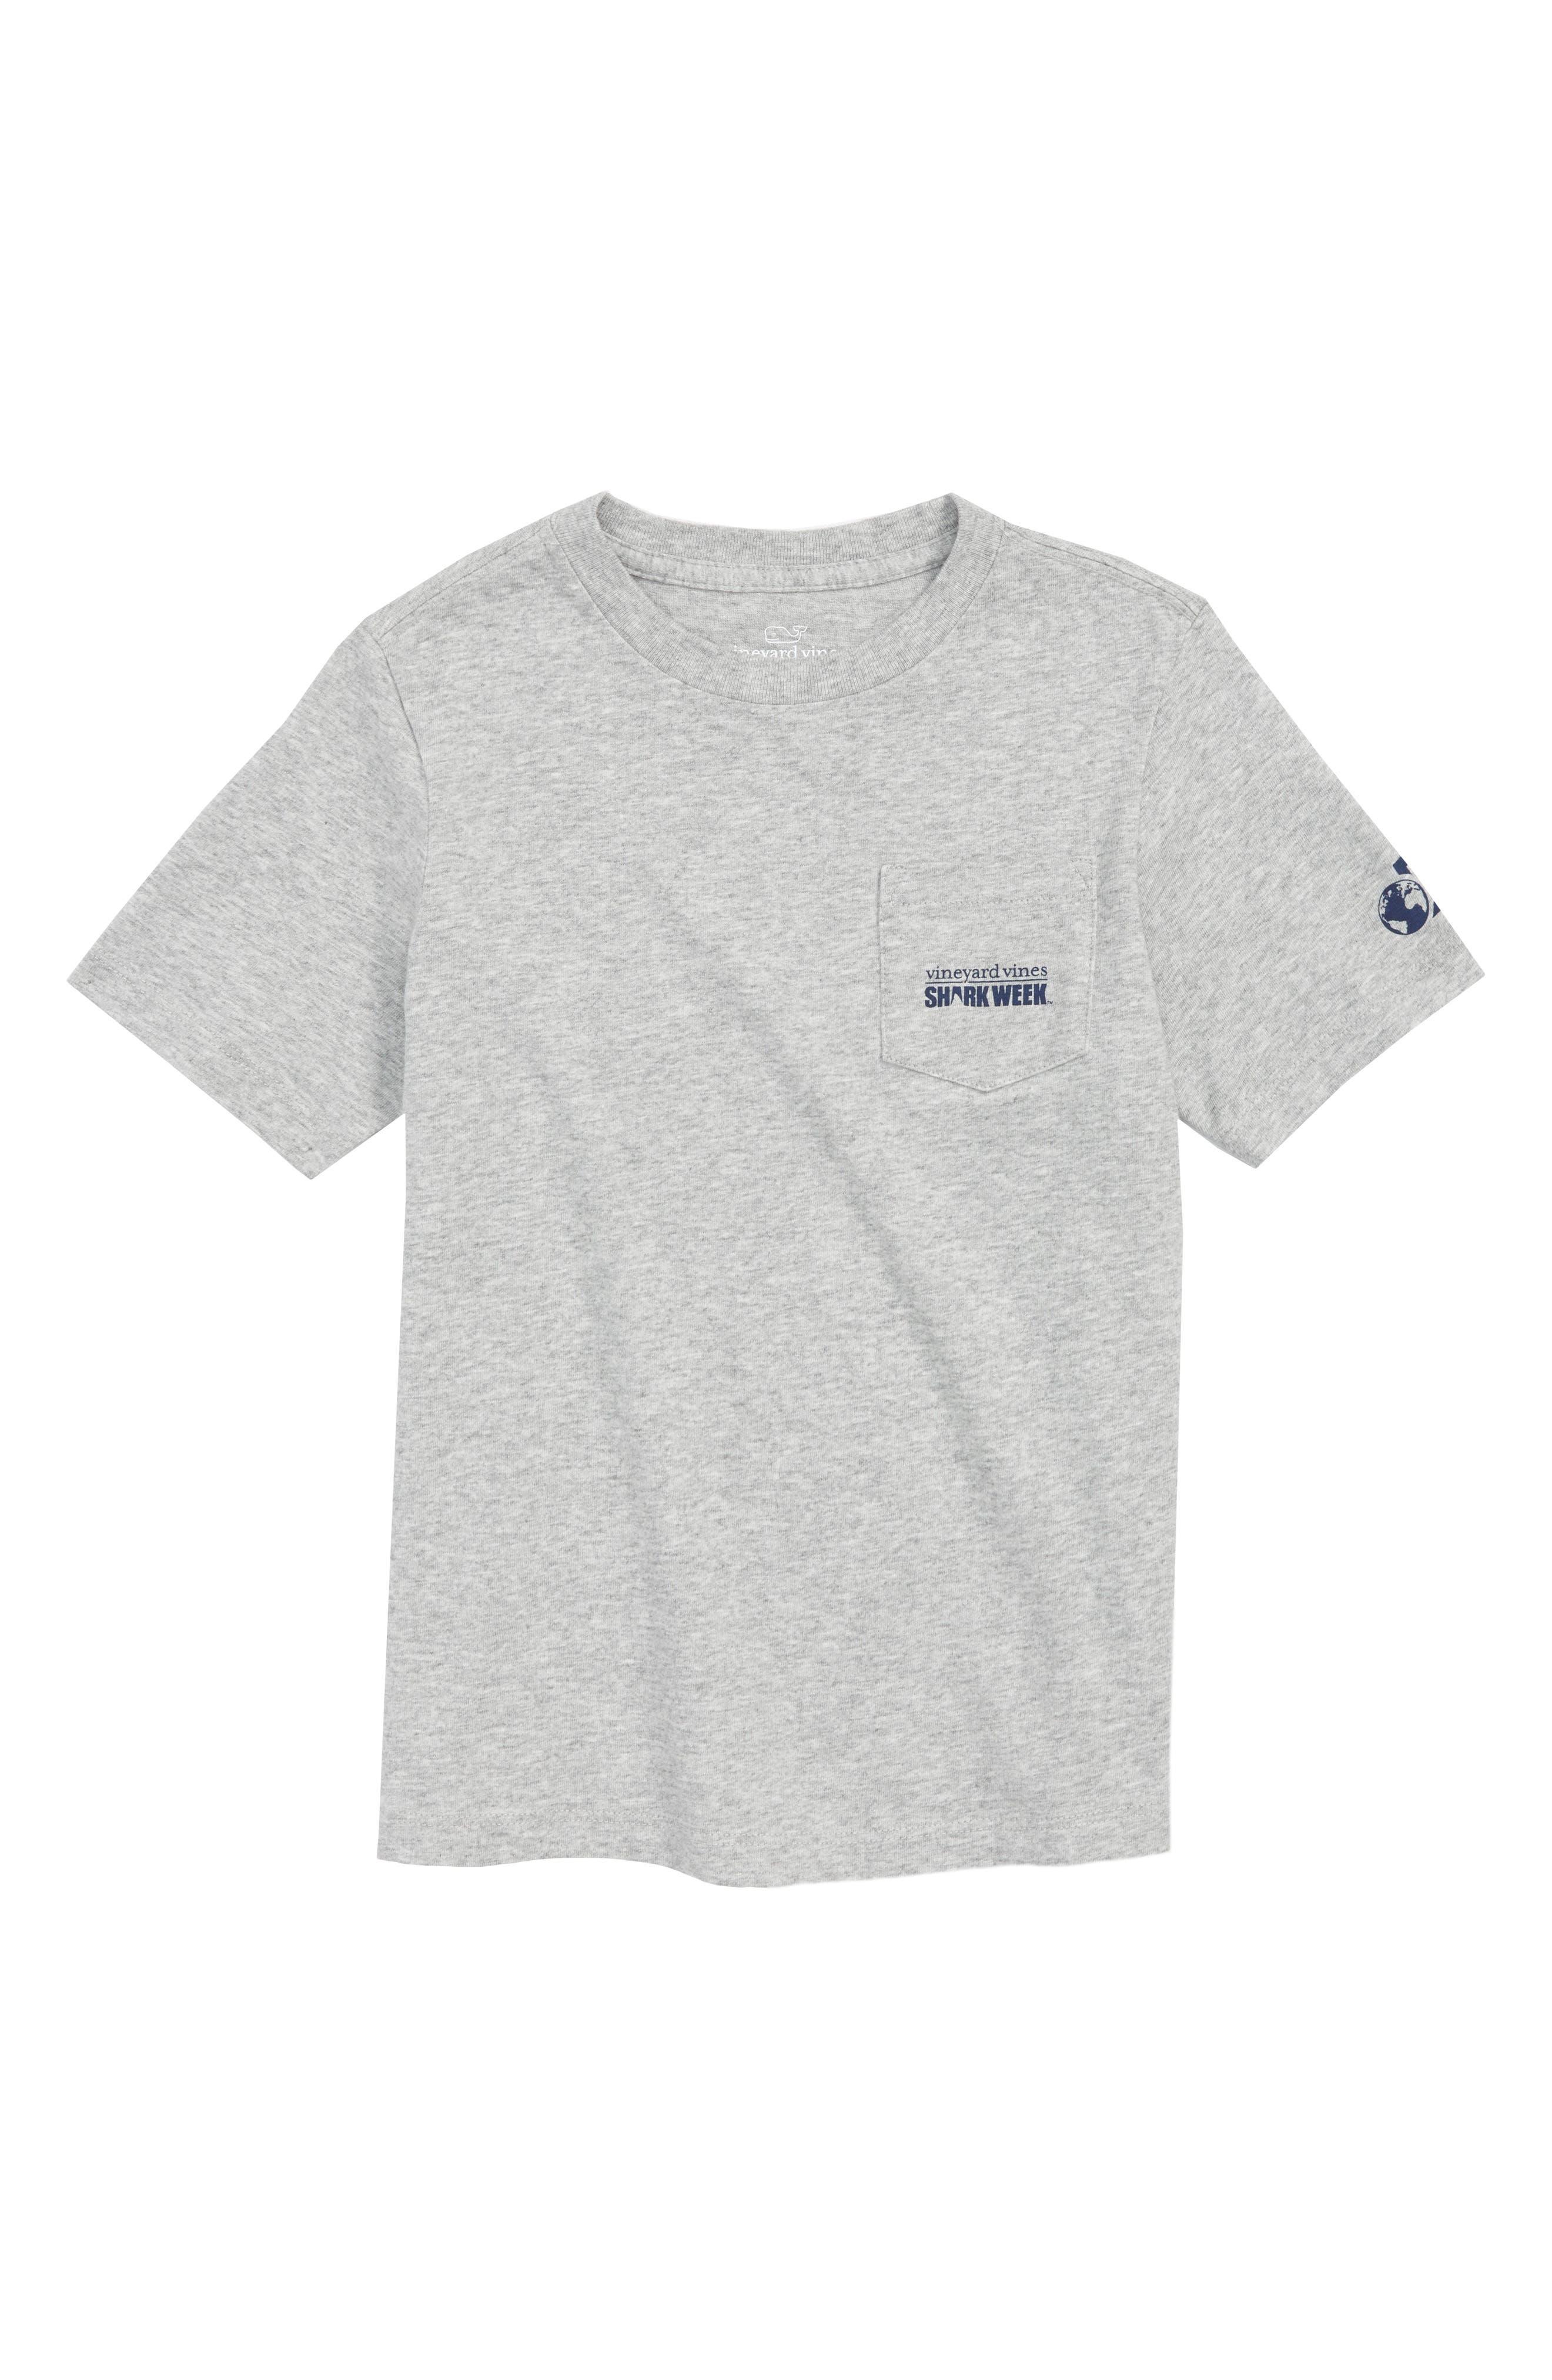 x Shark Week<sup>™</sup> Sharks & Stripes Pocket T-Shirt,                             Main thumbnail 1, color,                             GRAY HEATHER